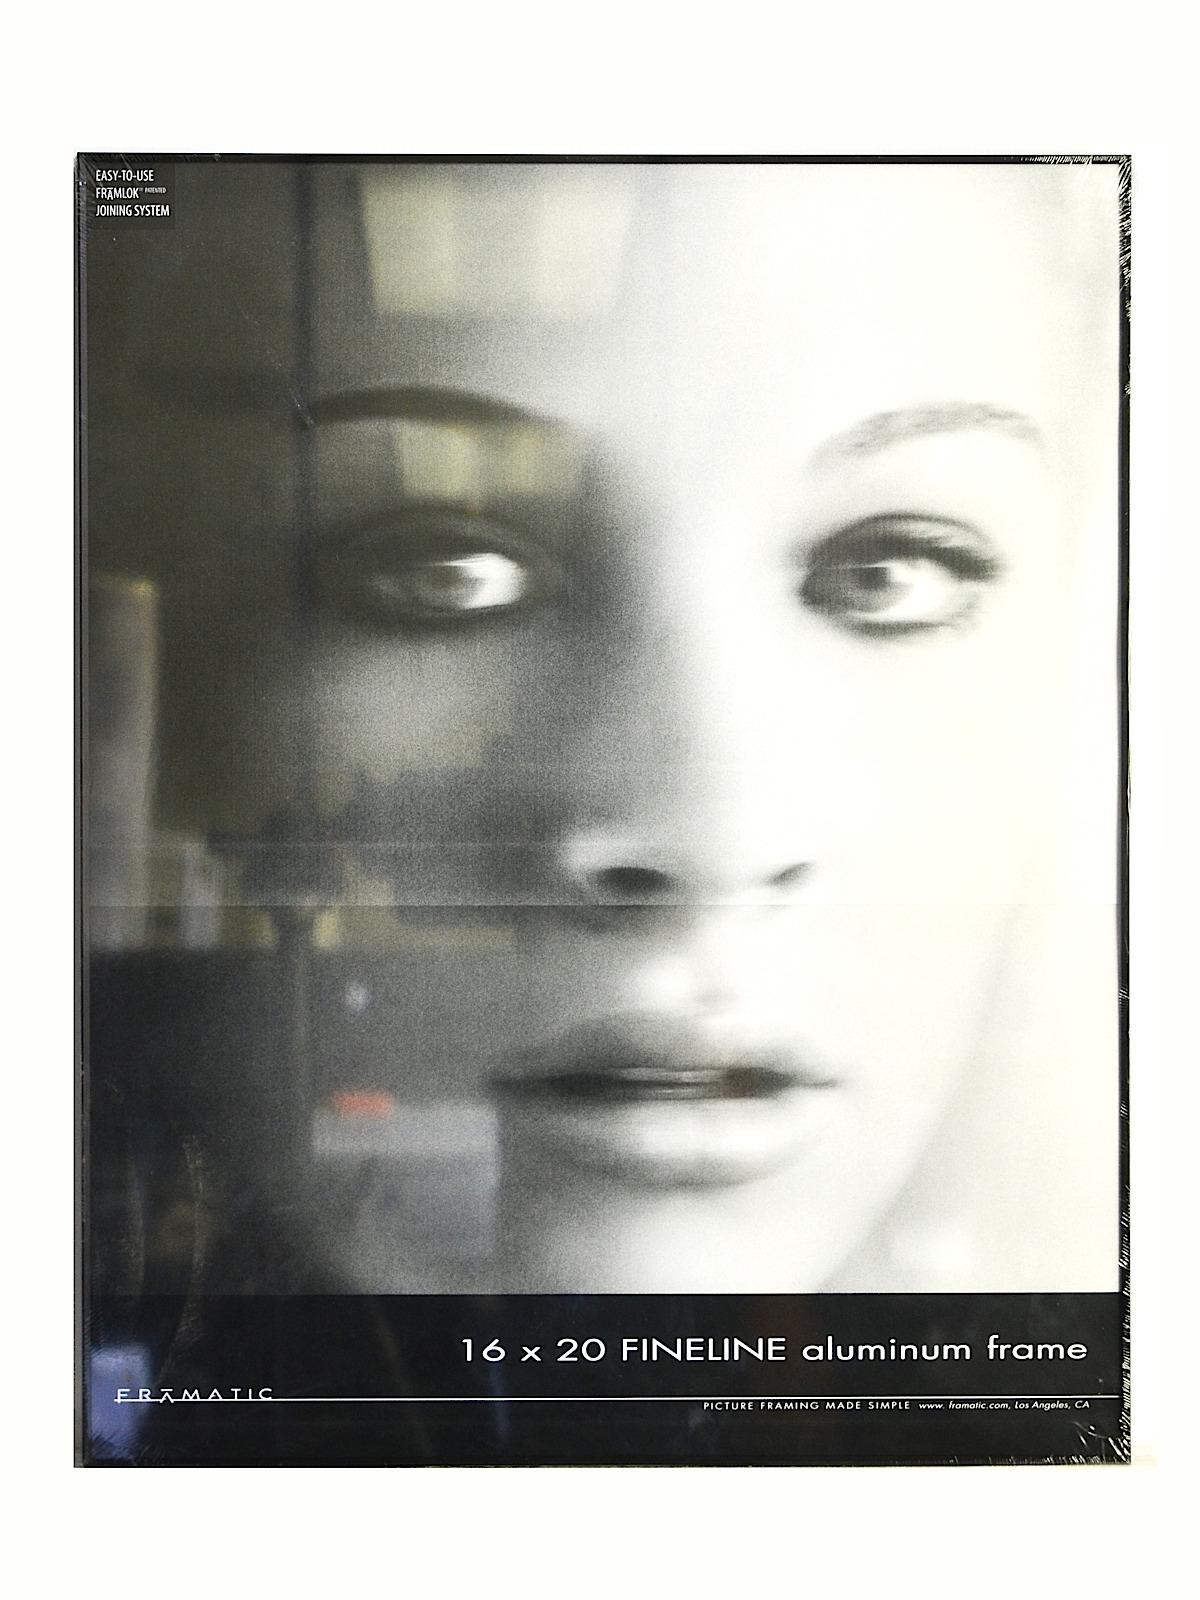 Framatic Fineline Aluminum Frames | MisterArt.com